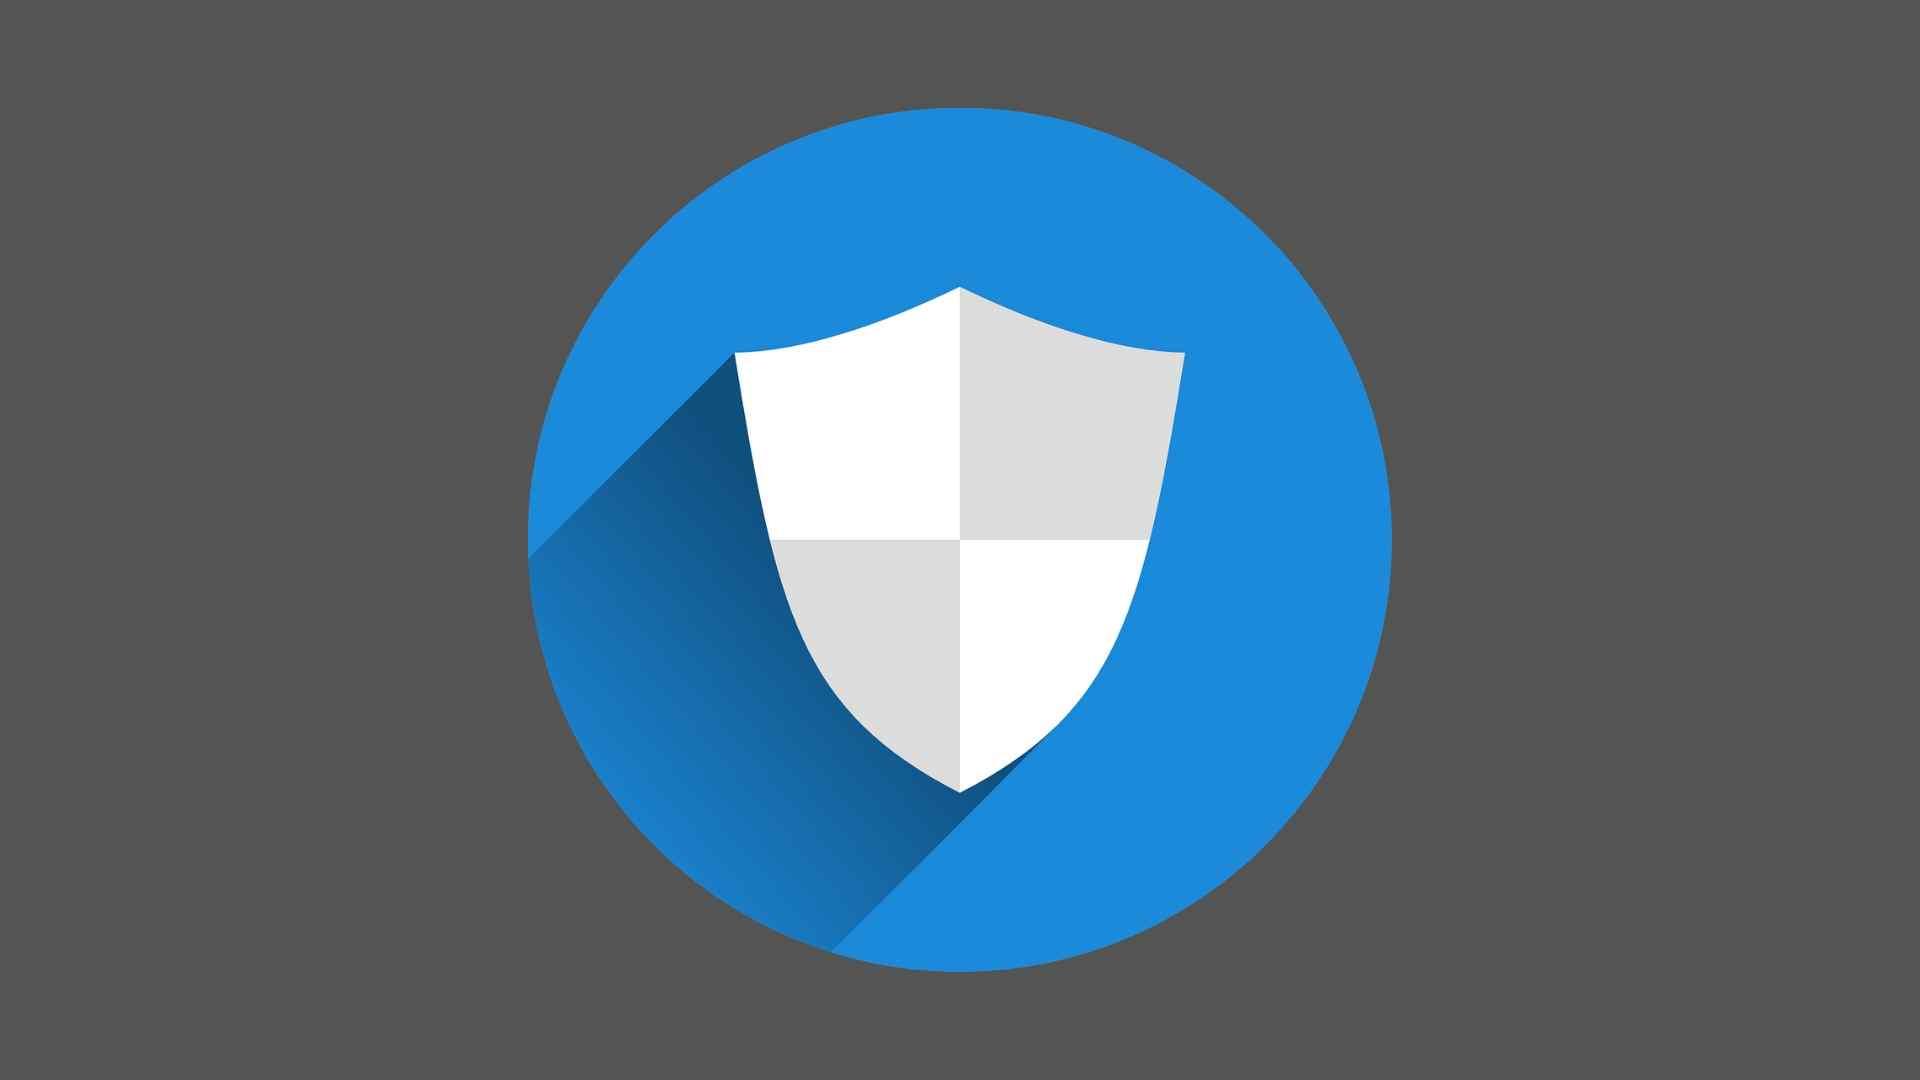 Microsoft Defender mobil platforma göz kırptı!